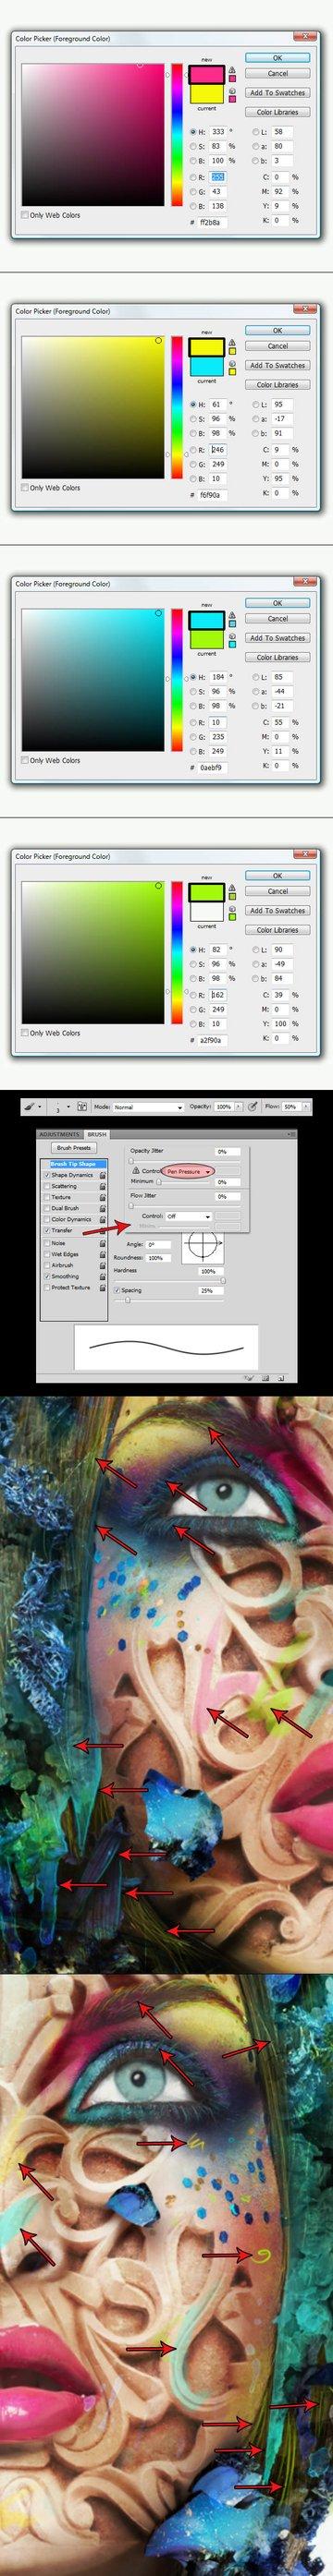 Add small strokes of color